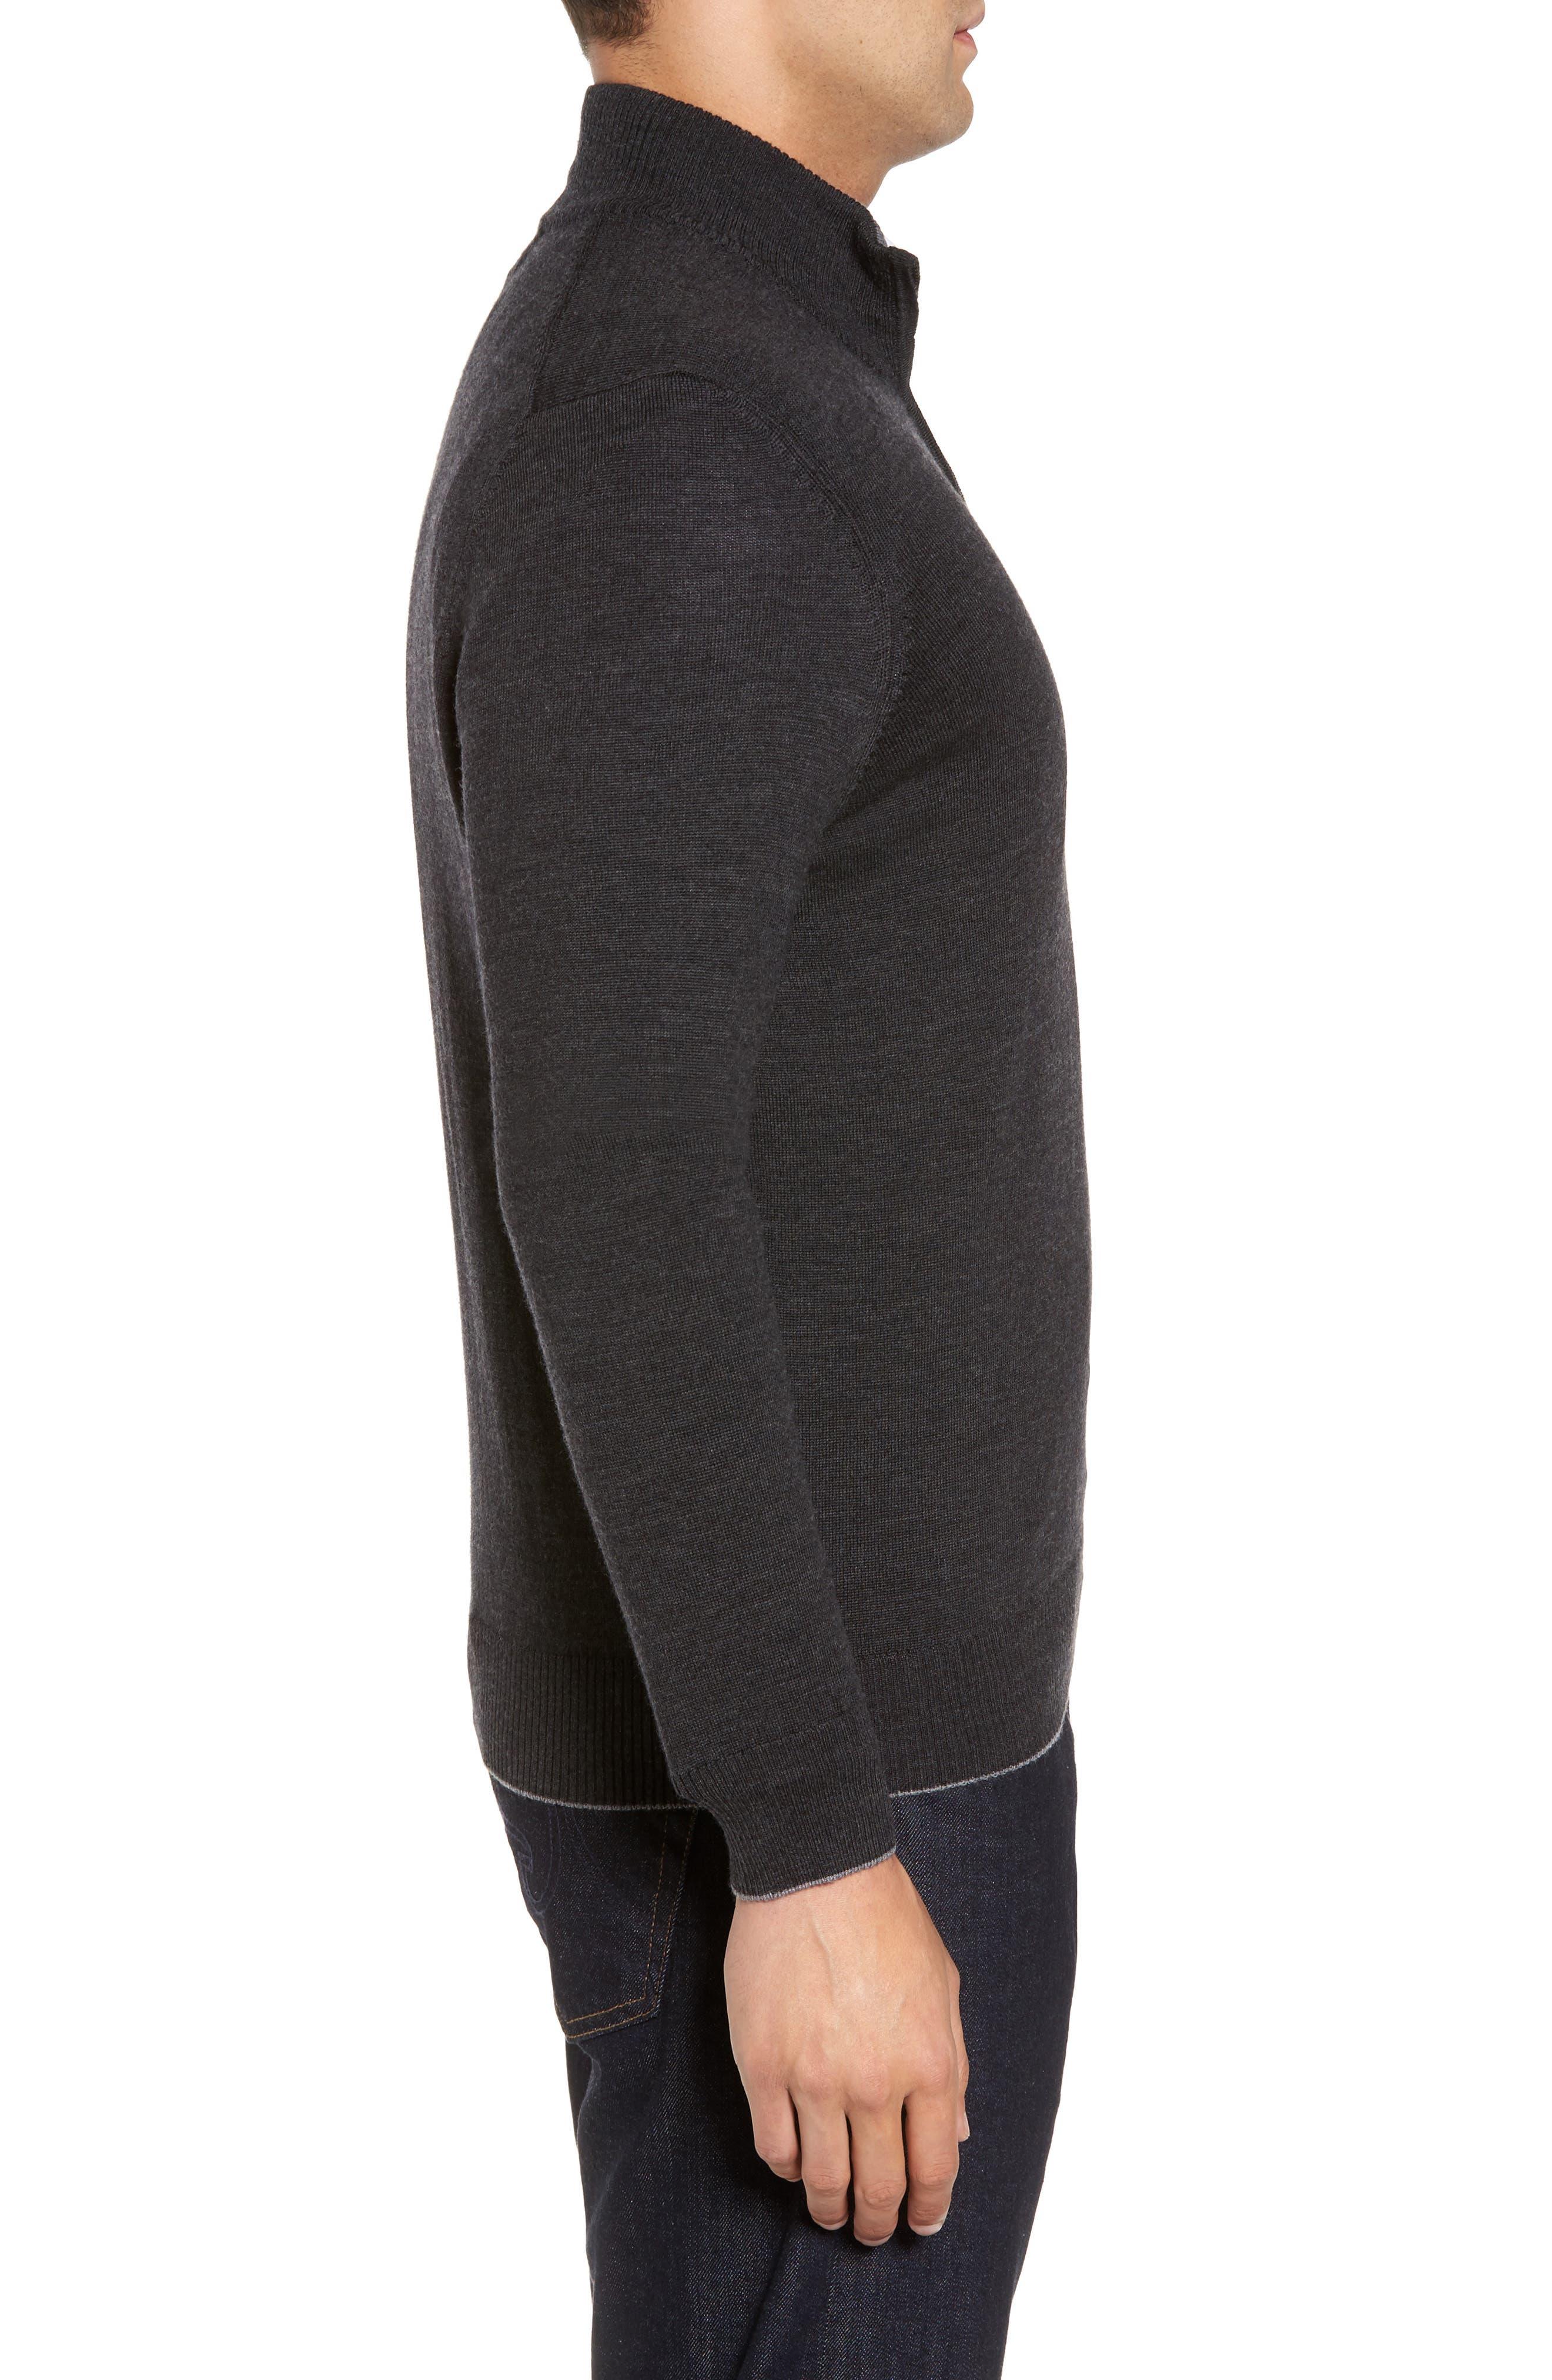 THOMAS DEAN,                             Merino Wool Blend Quarter Zip Sweater,                             Alternate thumbnail 3, color,                             020